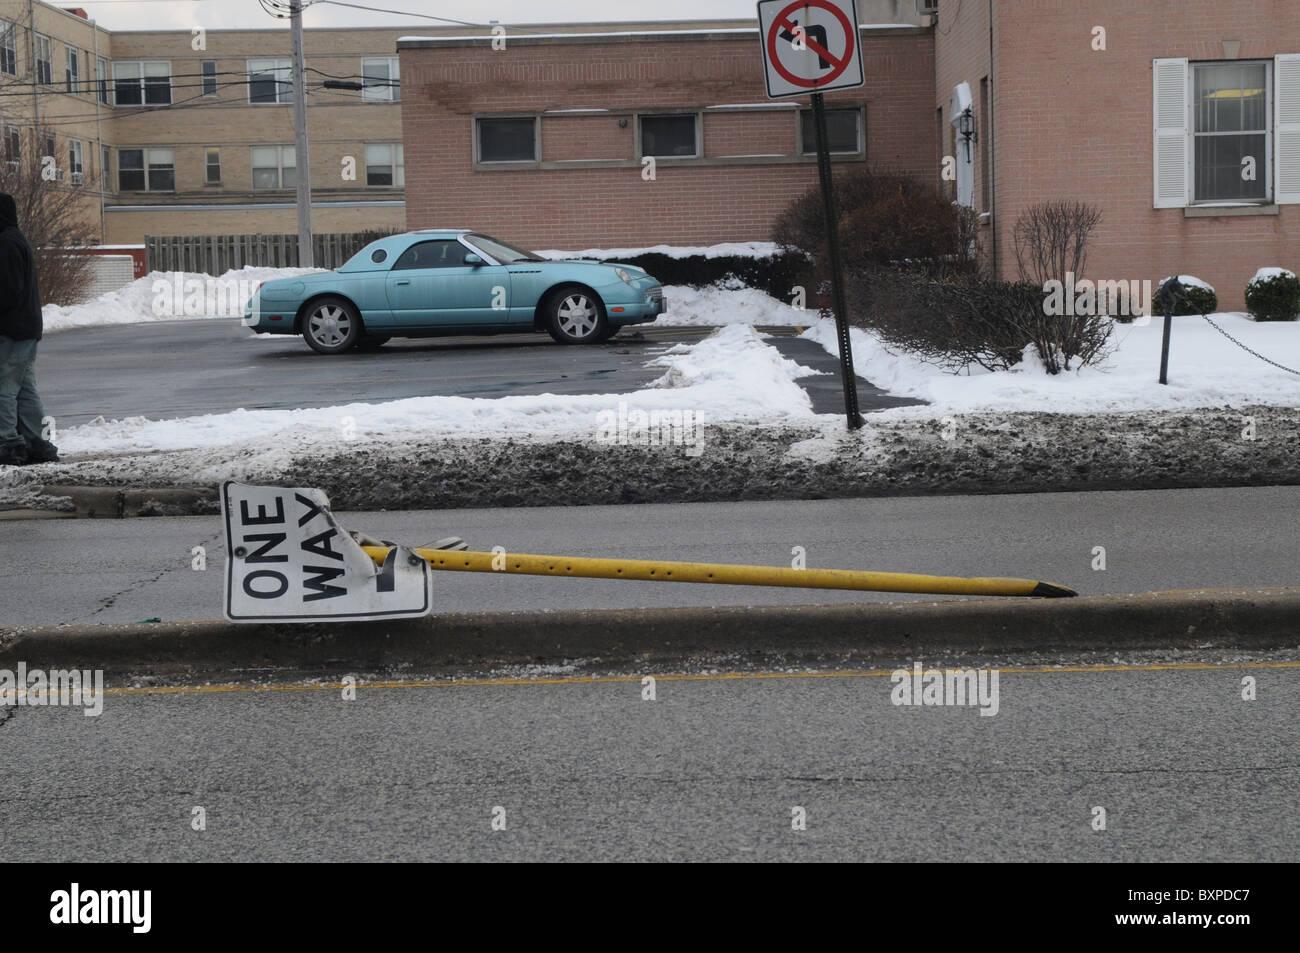 Fallen street sign - Stock Image